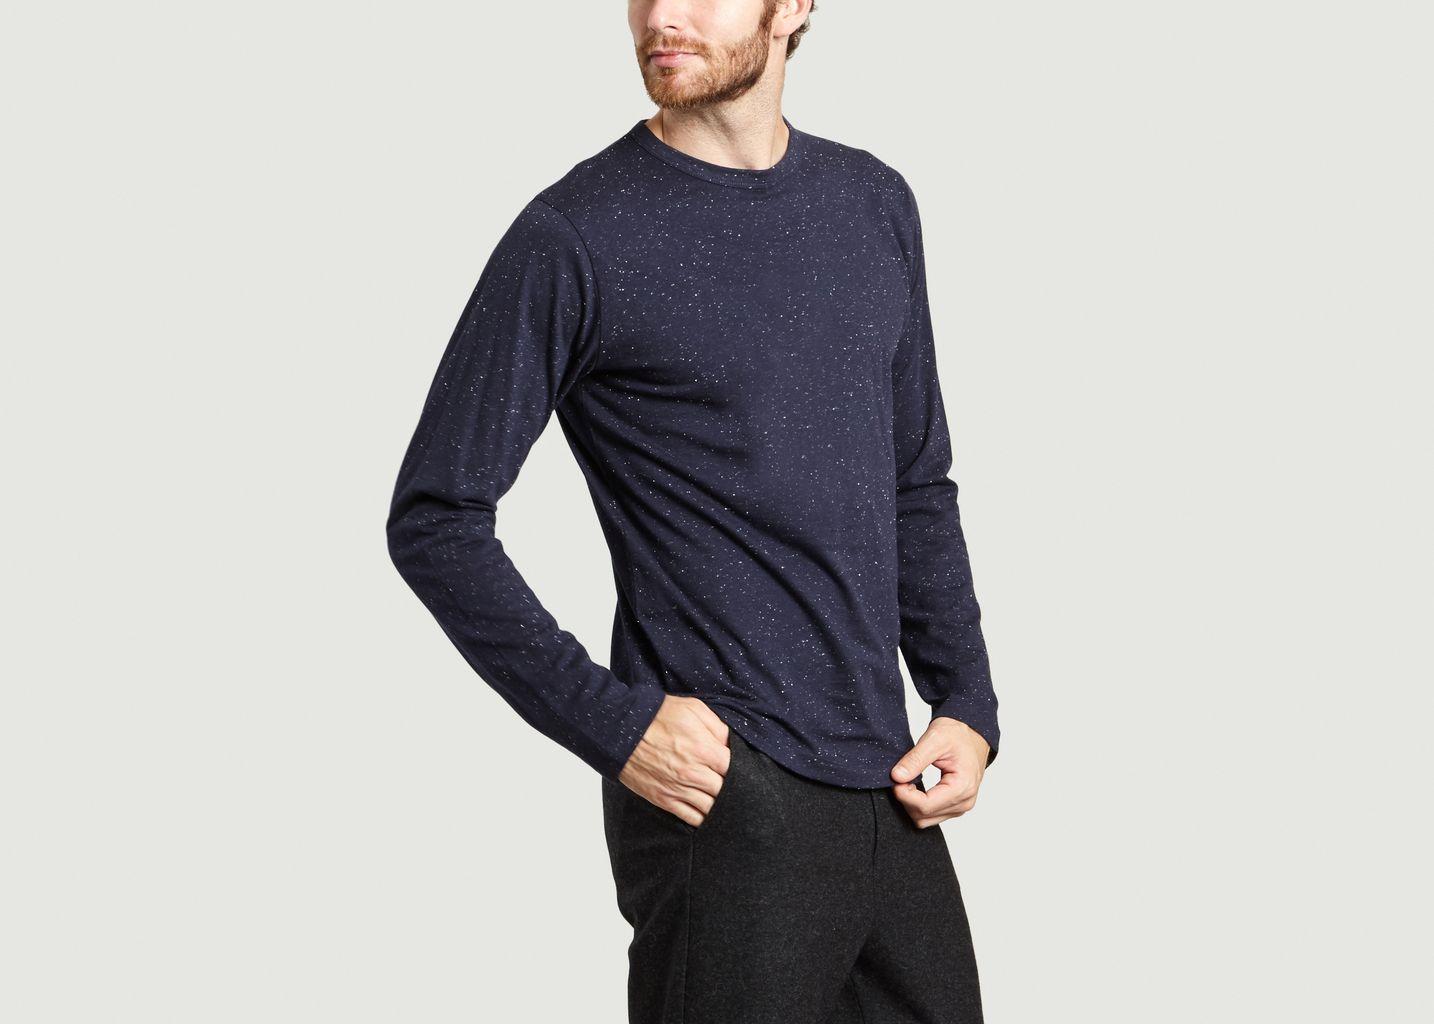 Tight T Shirt Navy Blue Agns B Lexception